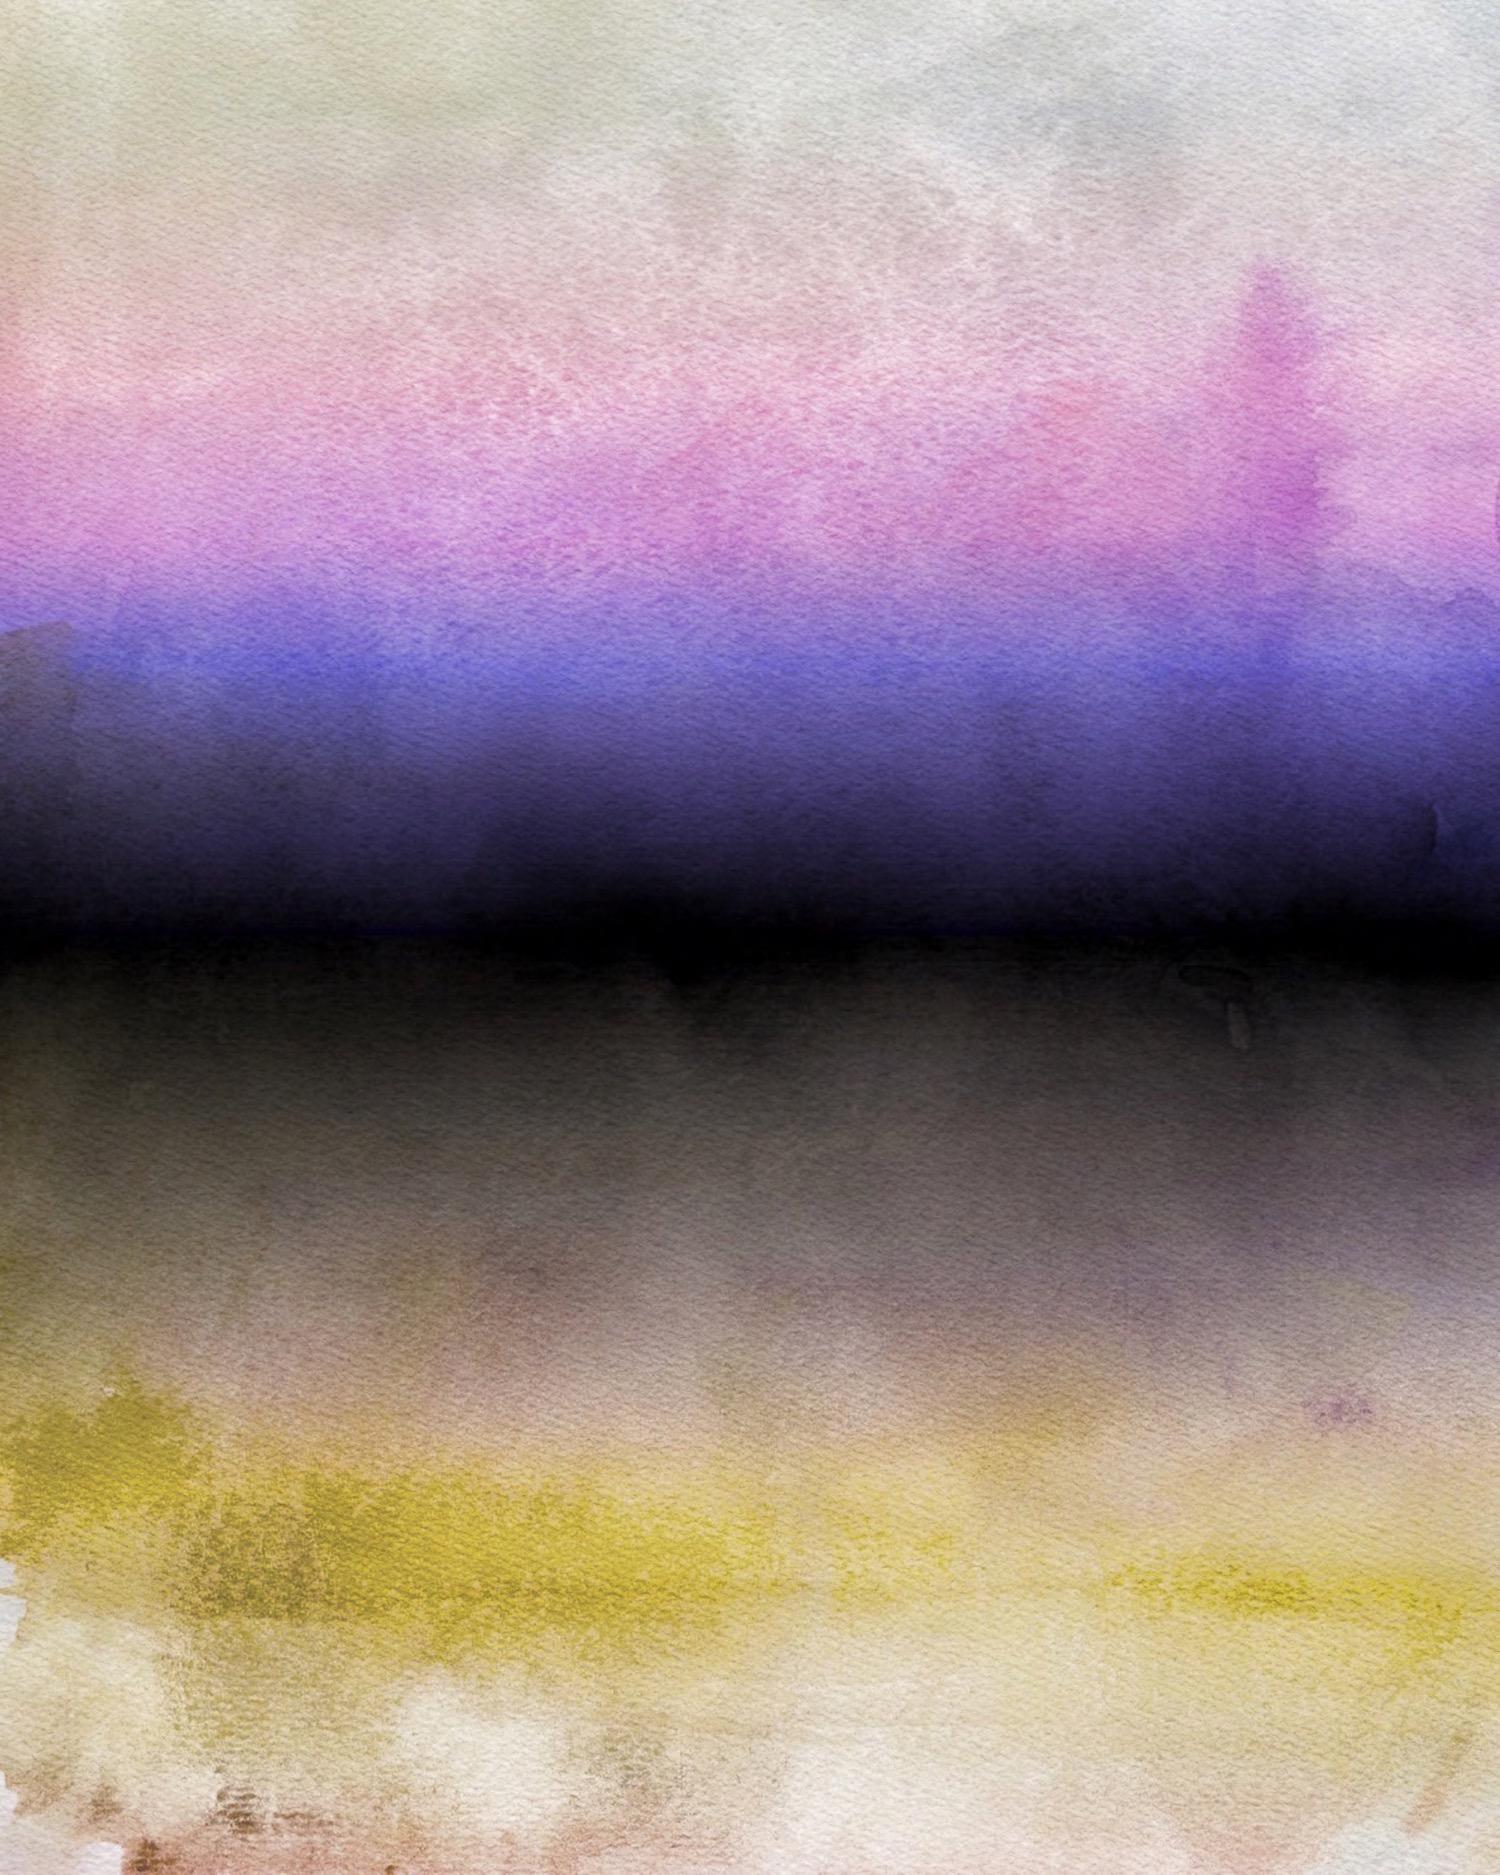 Abstract Minimalist Rothko Inspired 01-47